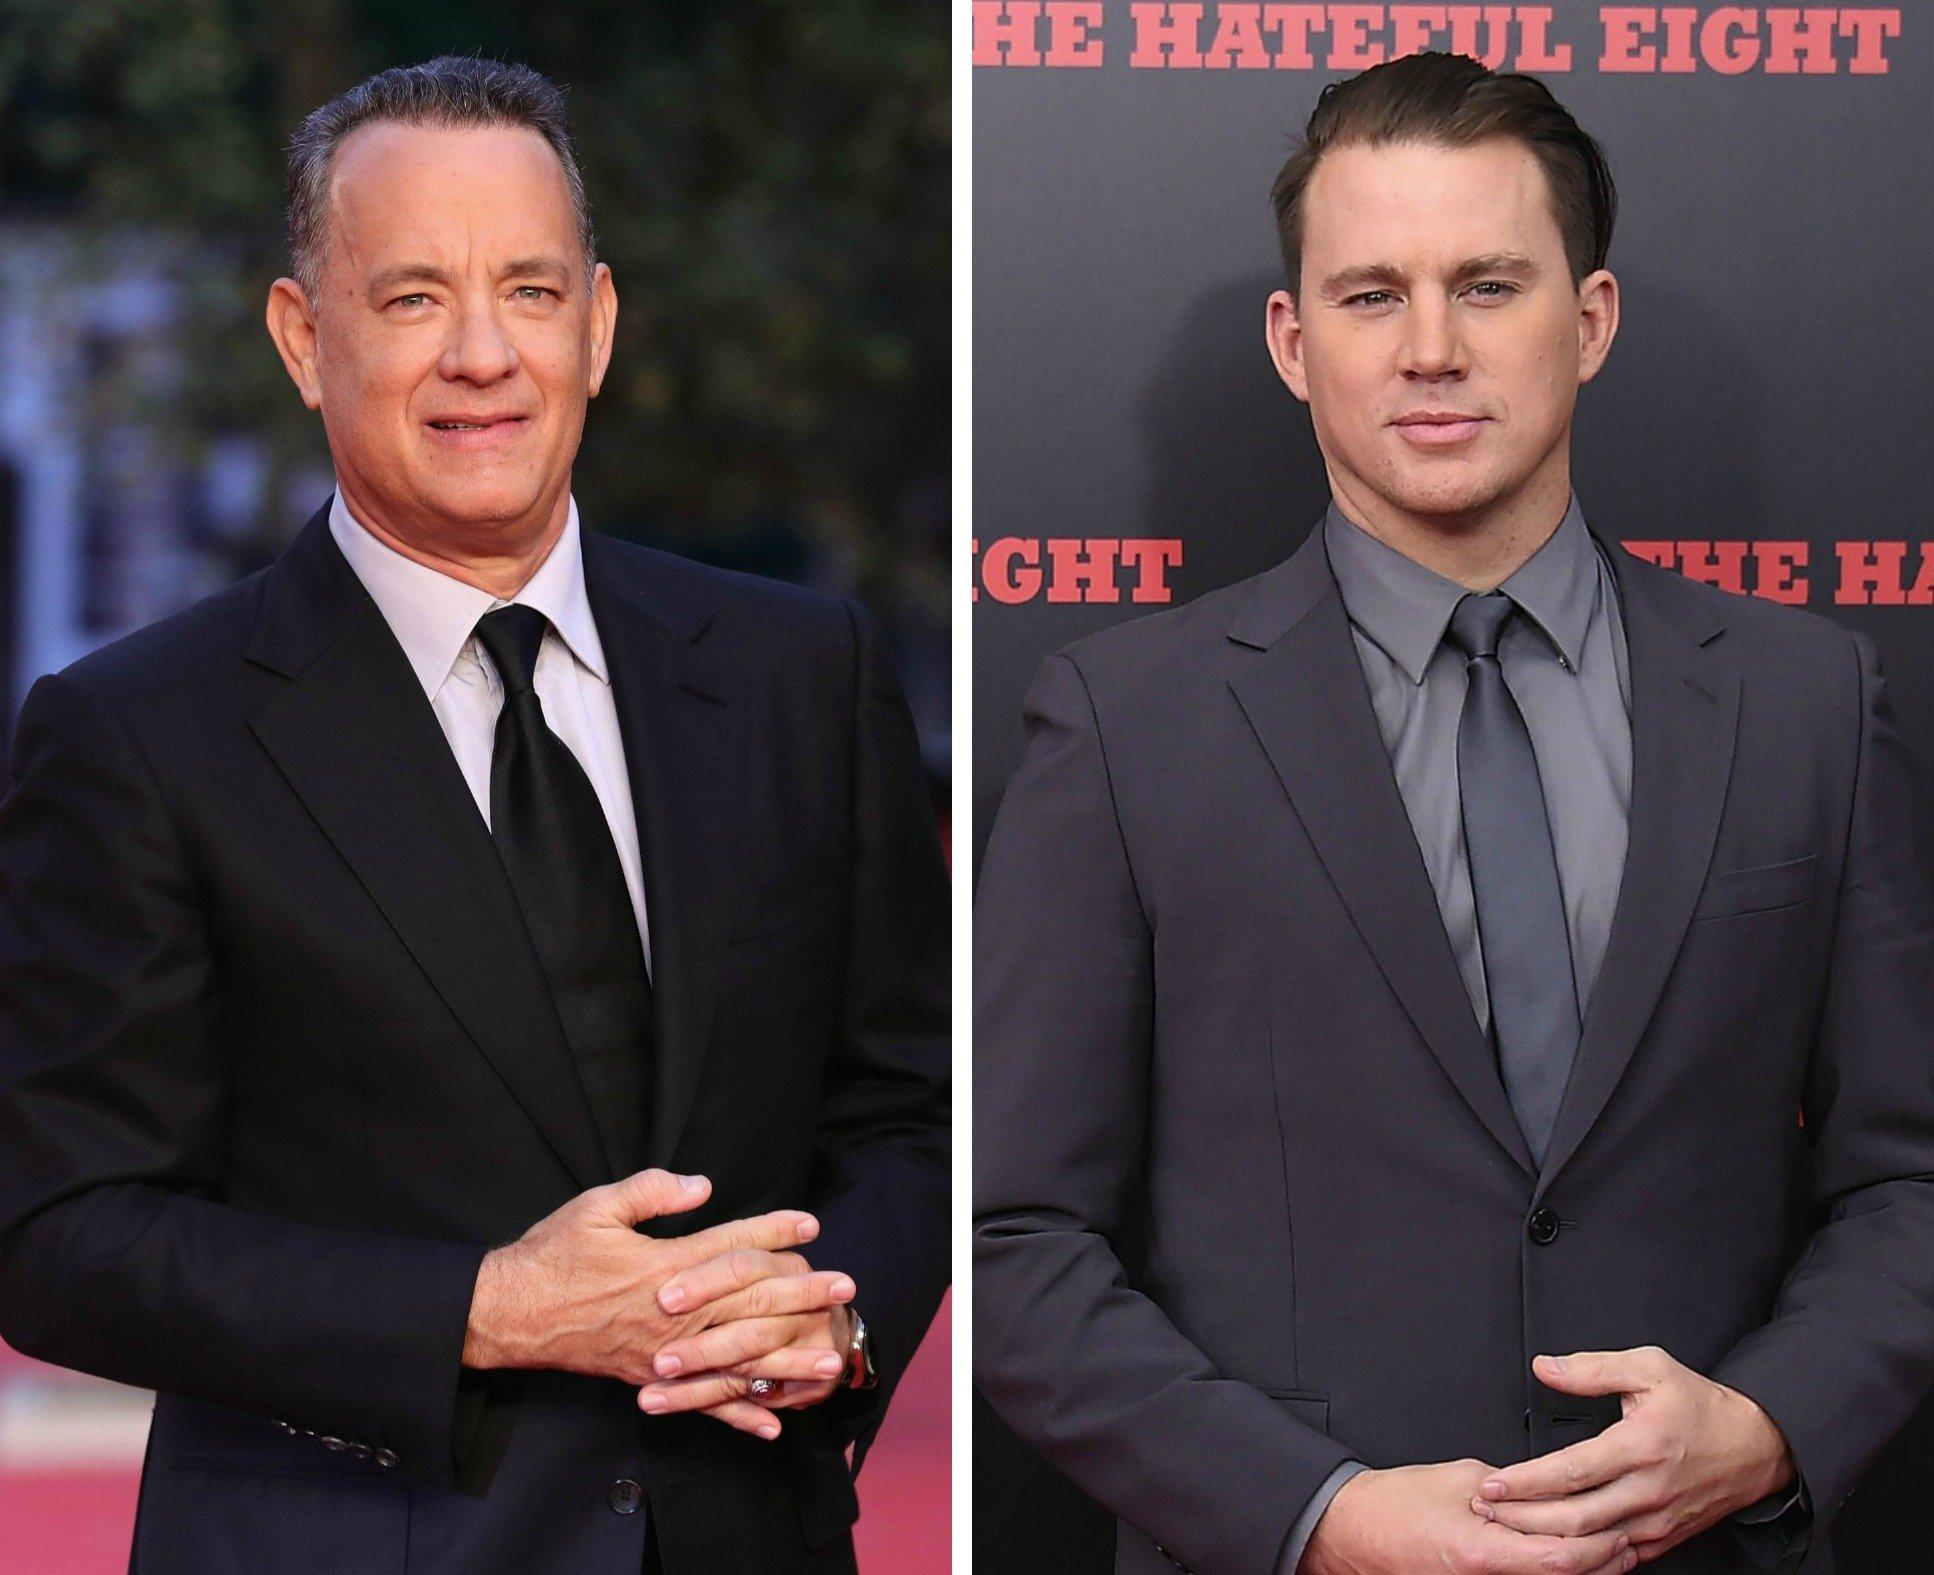 Tom Hanks and Channing Tatum